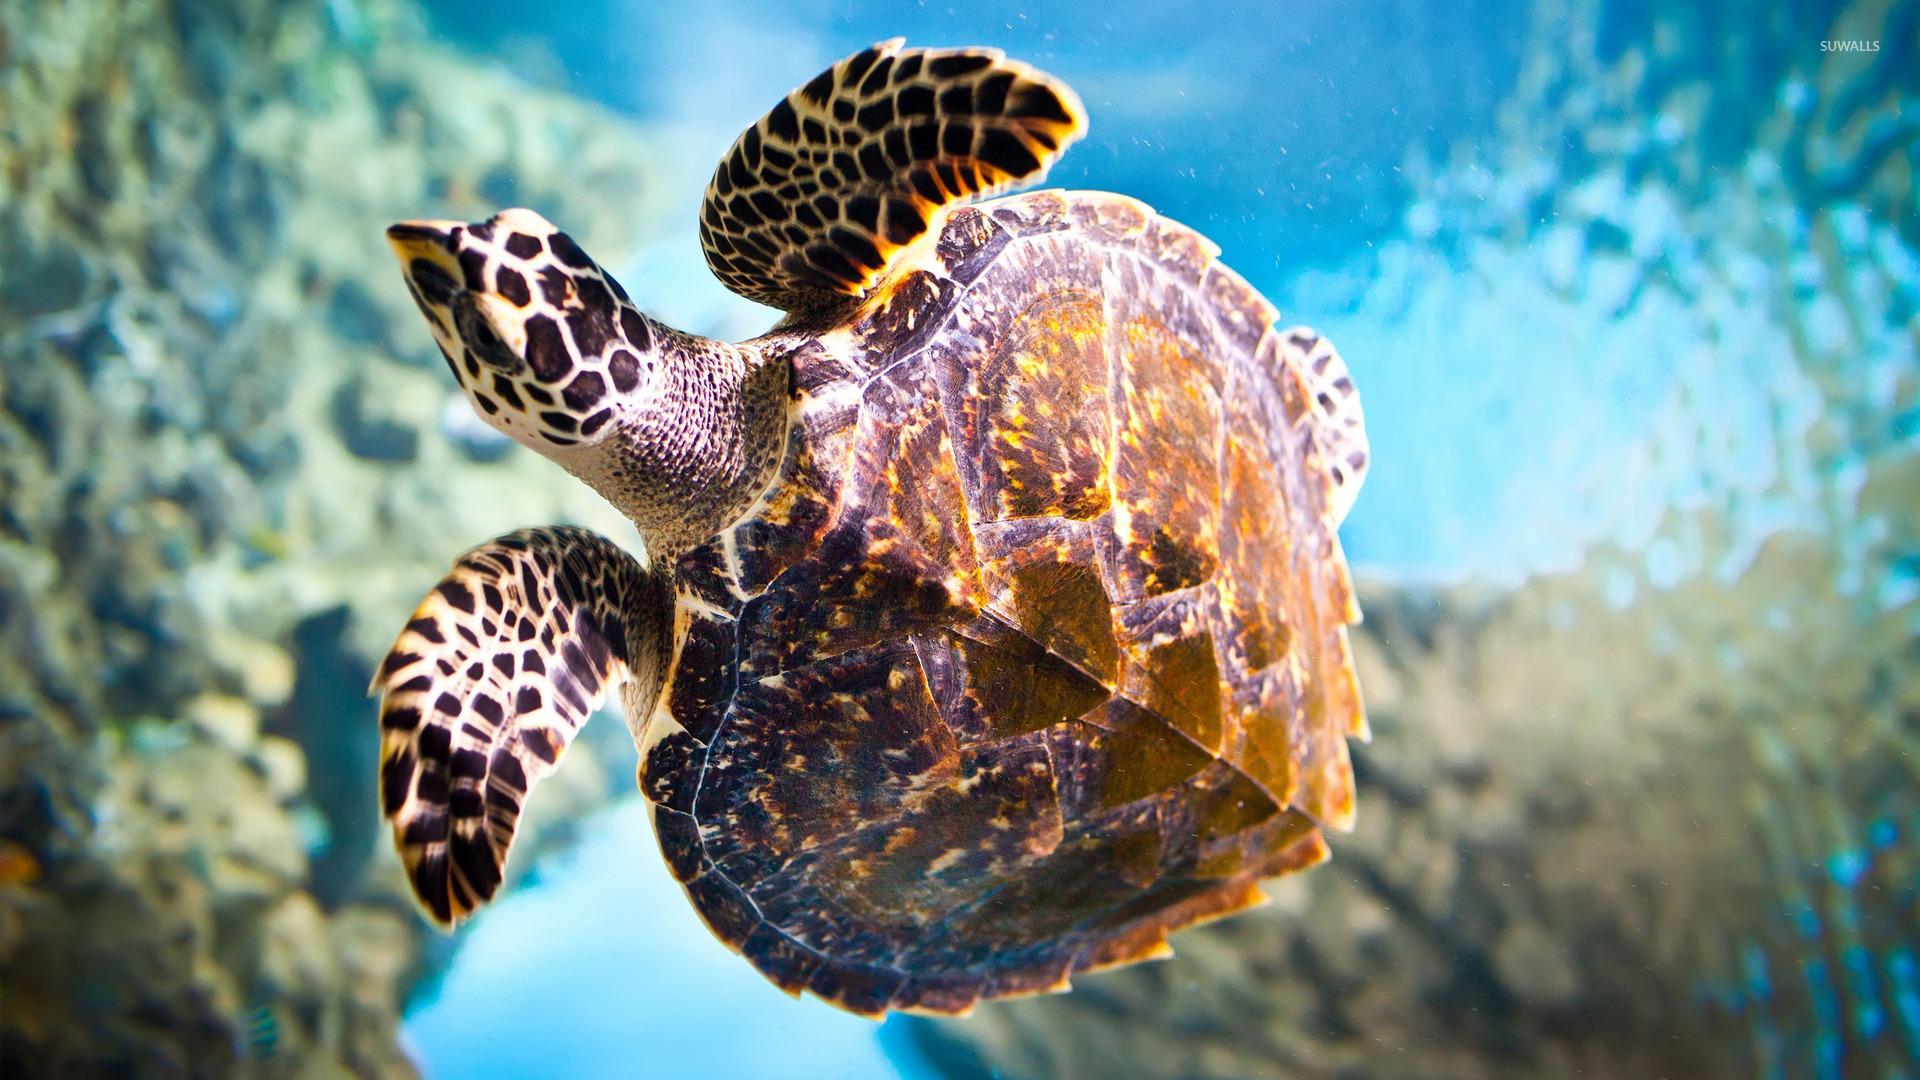 Sea Turtle Wallpaper Animal 1920x1080